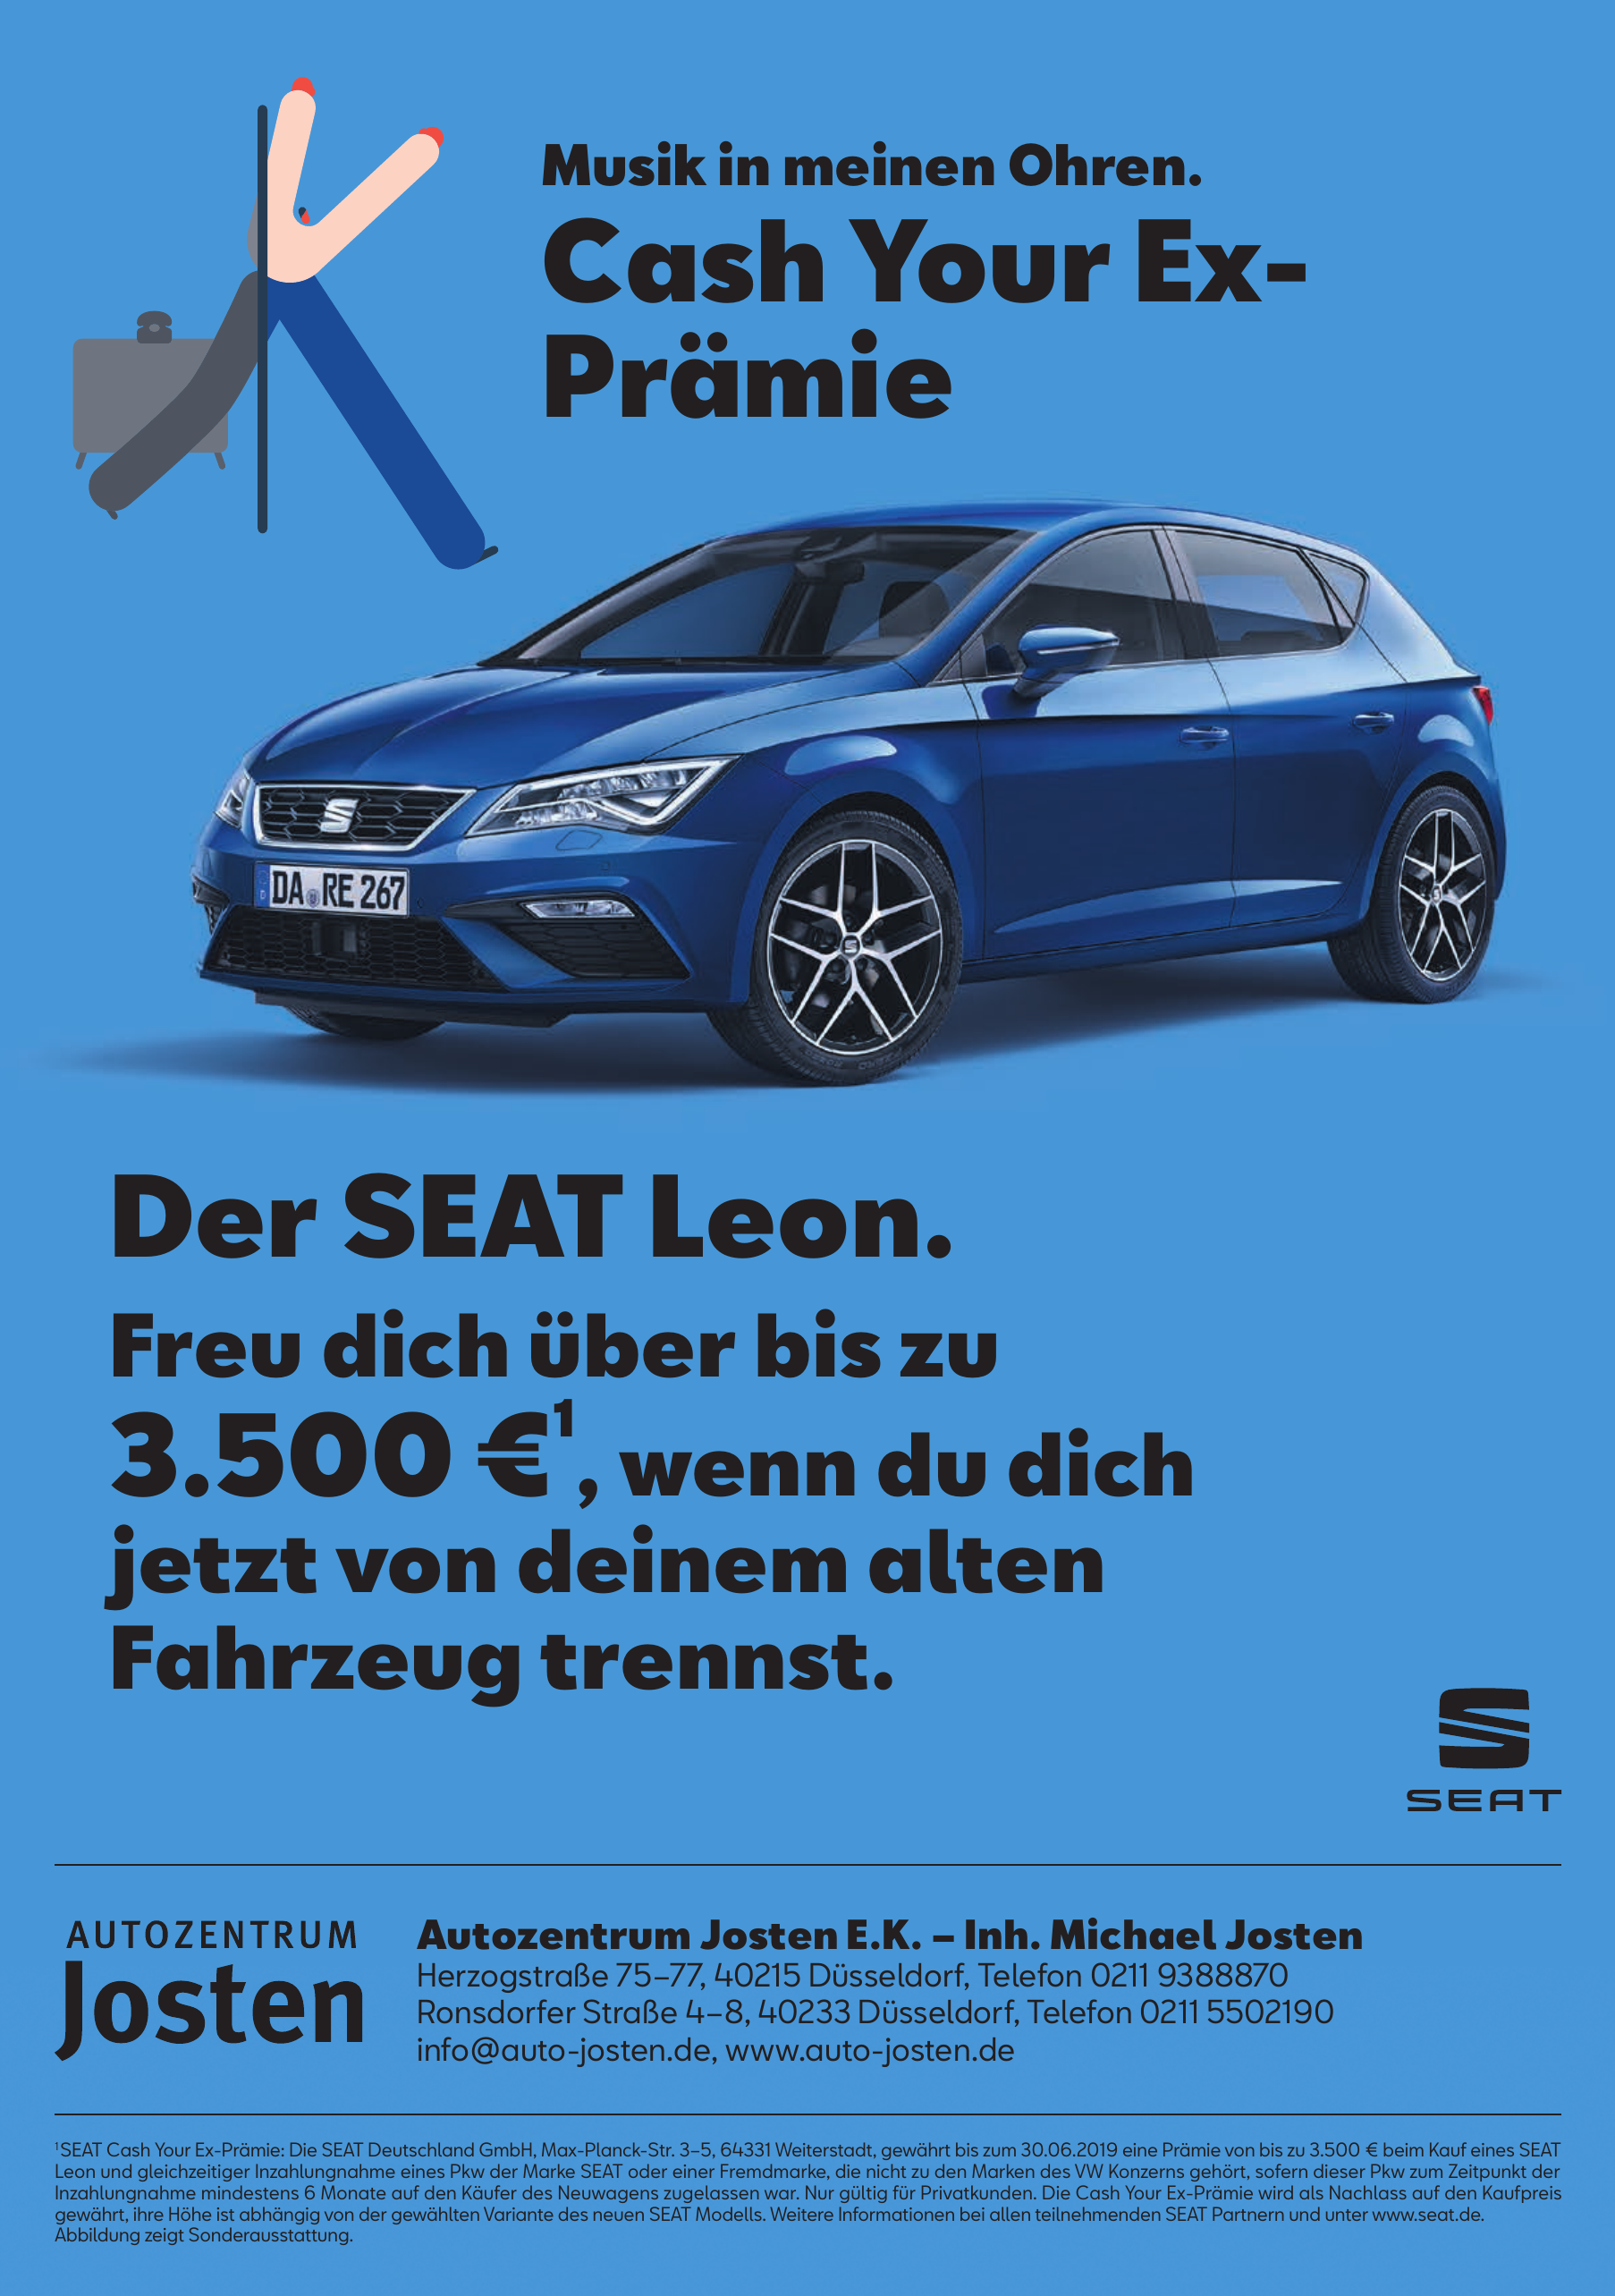 Autozentrum Josten E.K. – Inh. Michael Josten